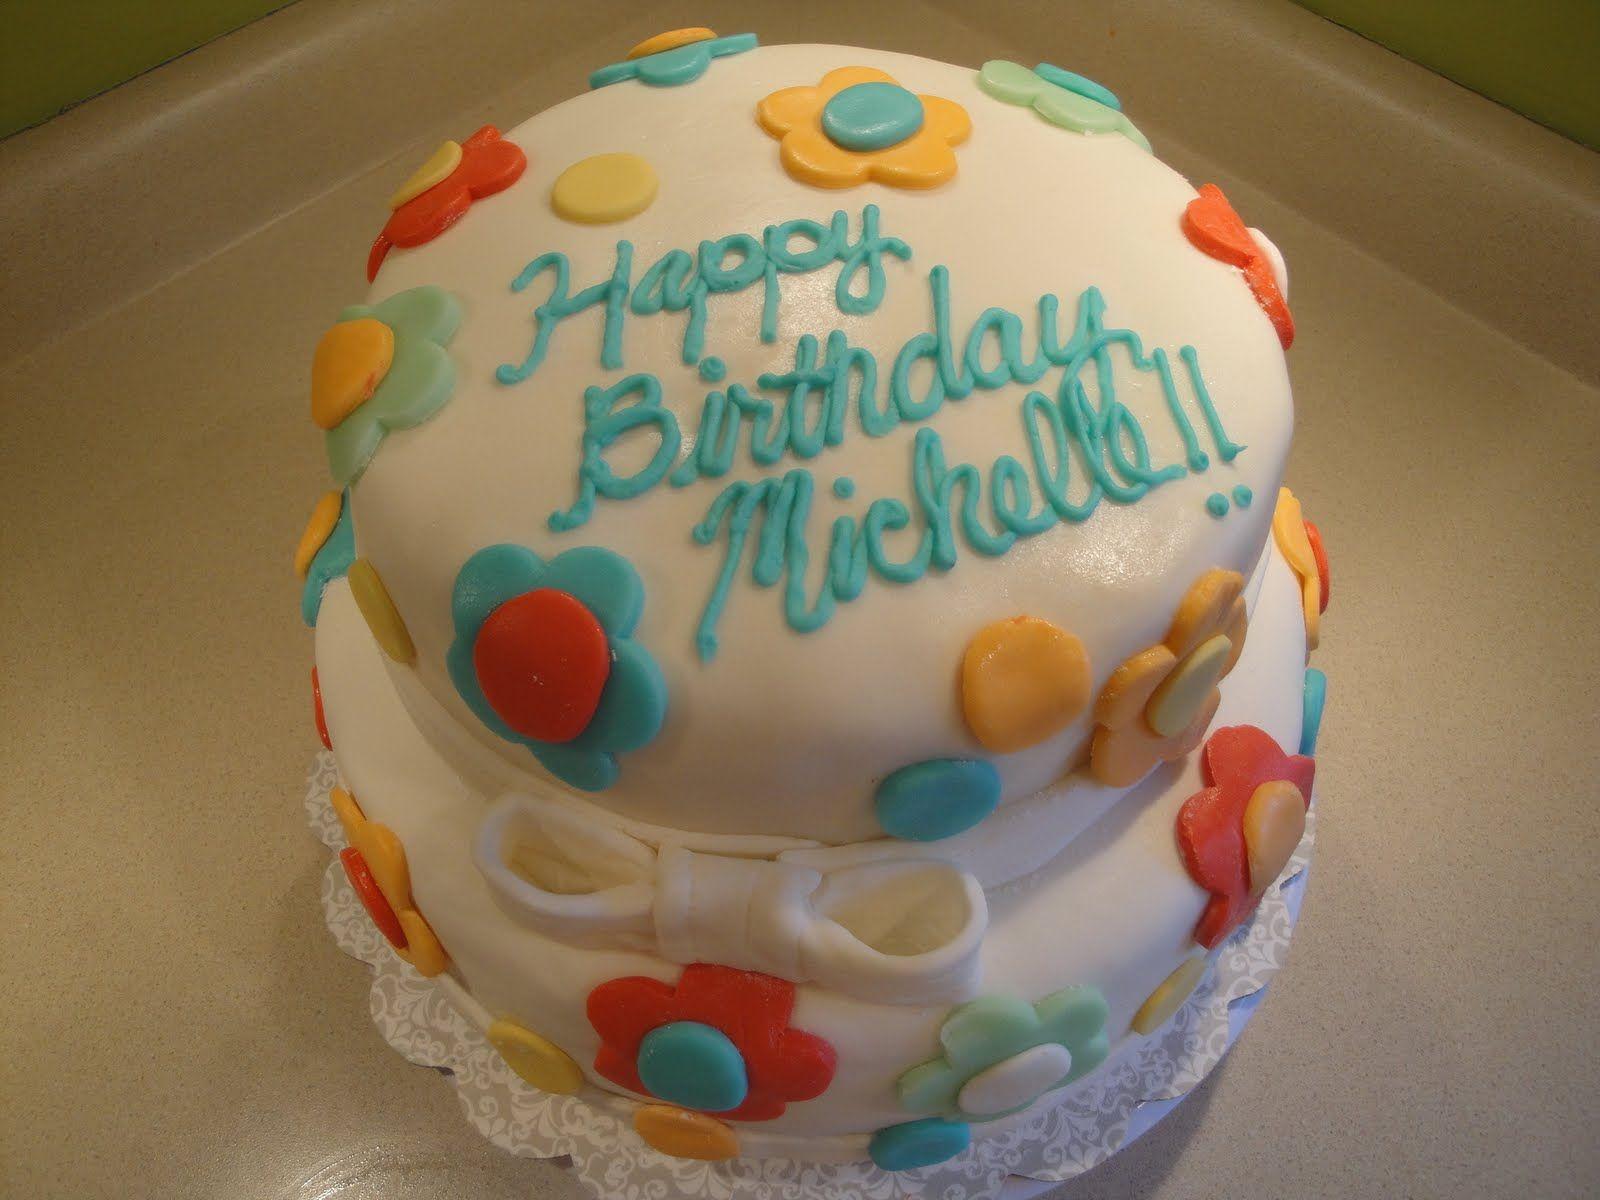 Groovy Michelle Obama Birthday Cake Michelle Birthday Cake Birthday Funny Birthday Cards Online Inifodamsfinfo